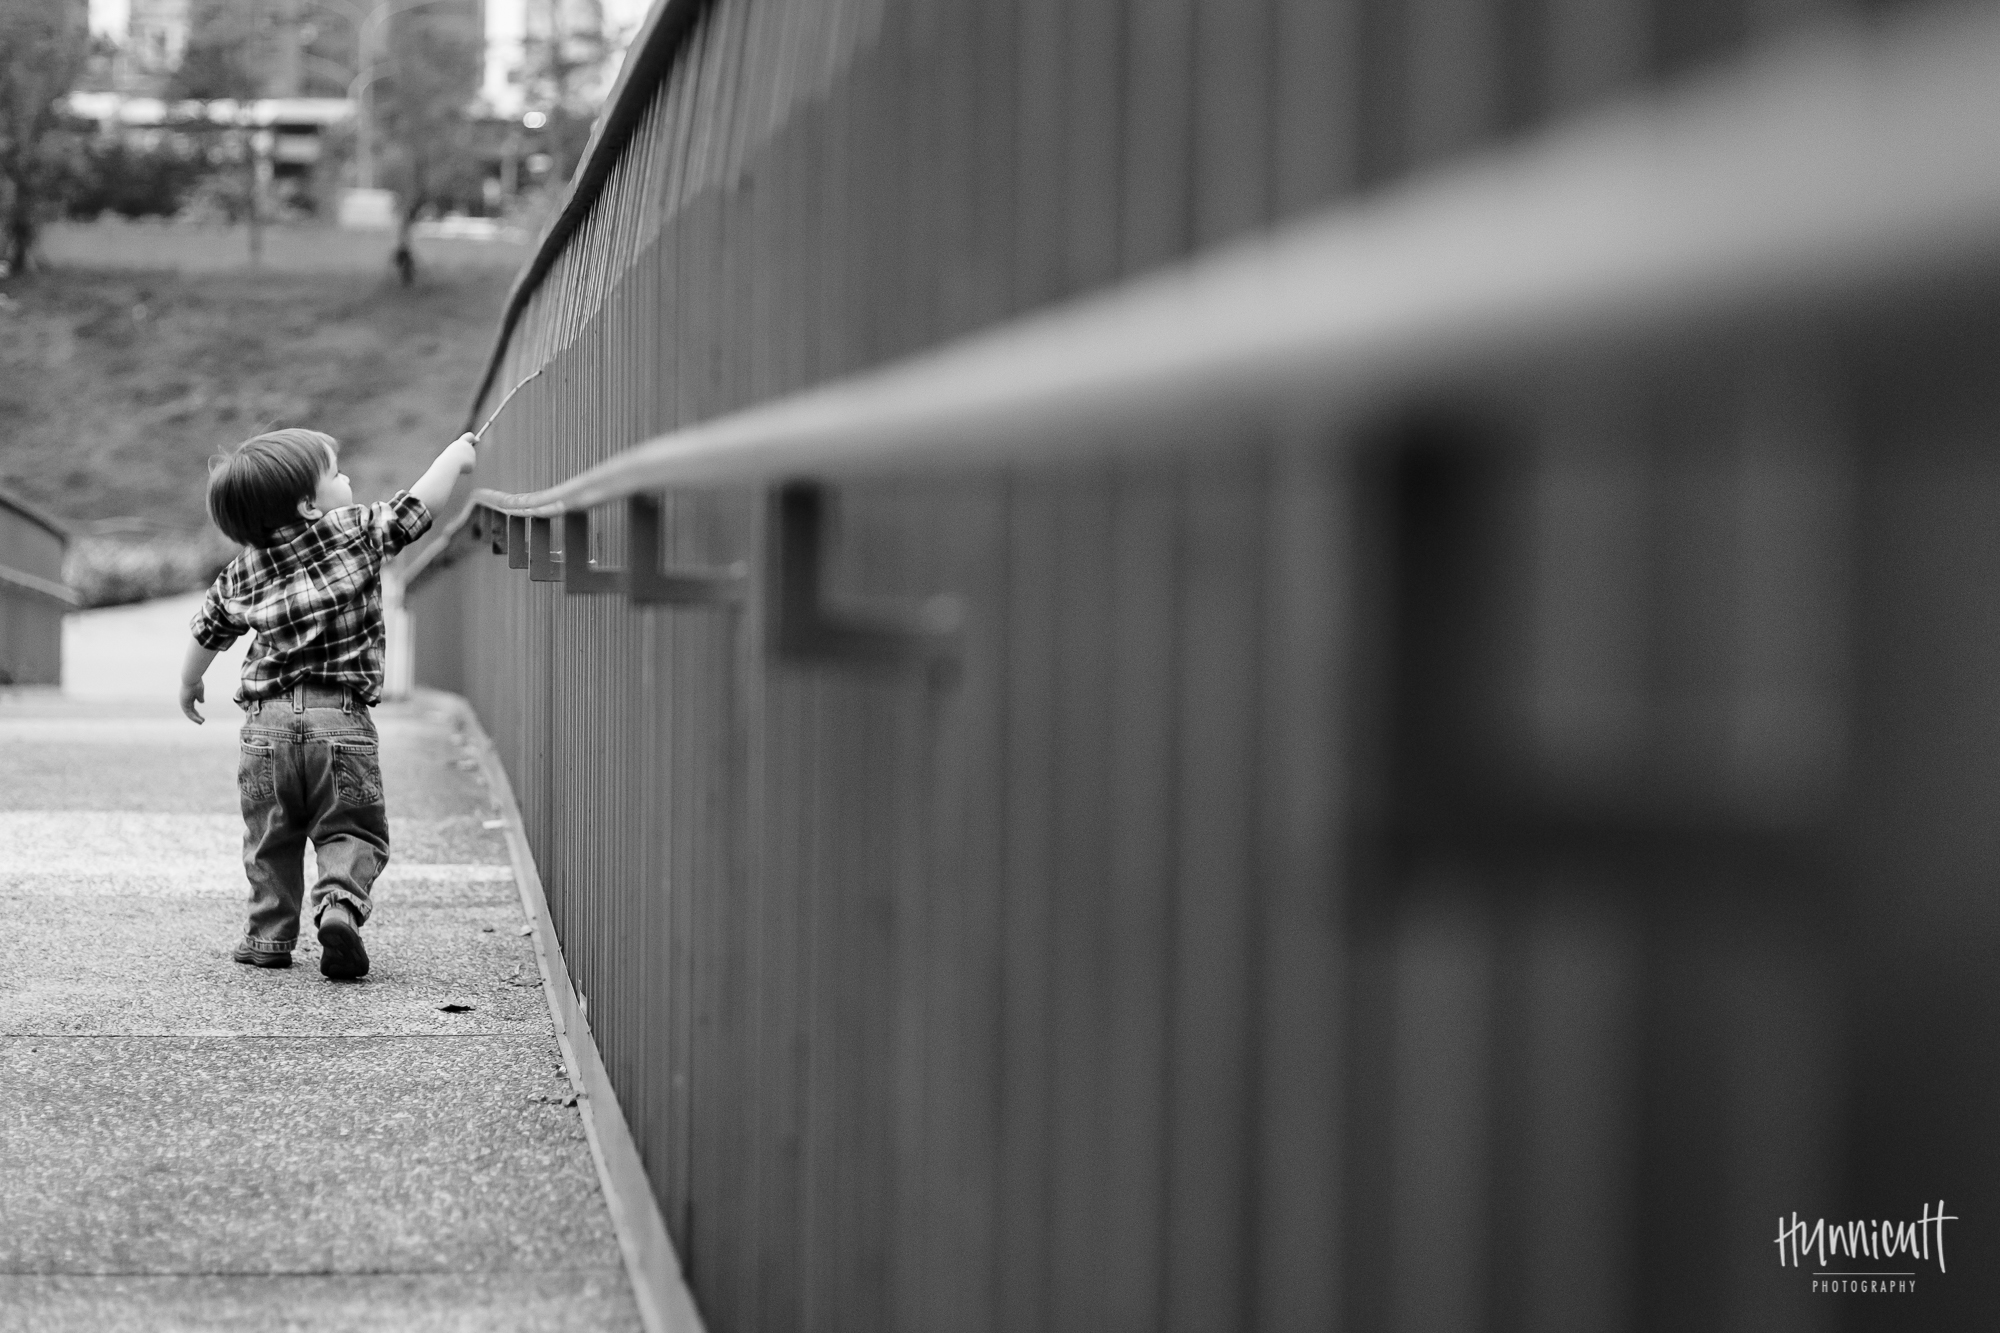 Outdoor-Modern-Urban-Family-Hunnicutt-Photography-Rebecca-Hunnicutt-Farren-Taichung-Taiwan-Exploring-Neighborhood-21